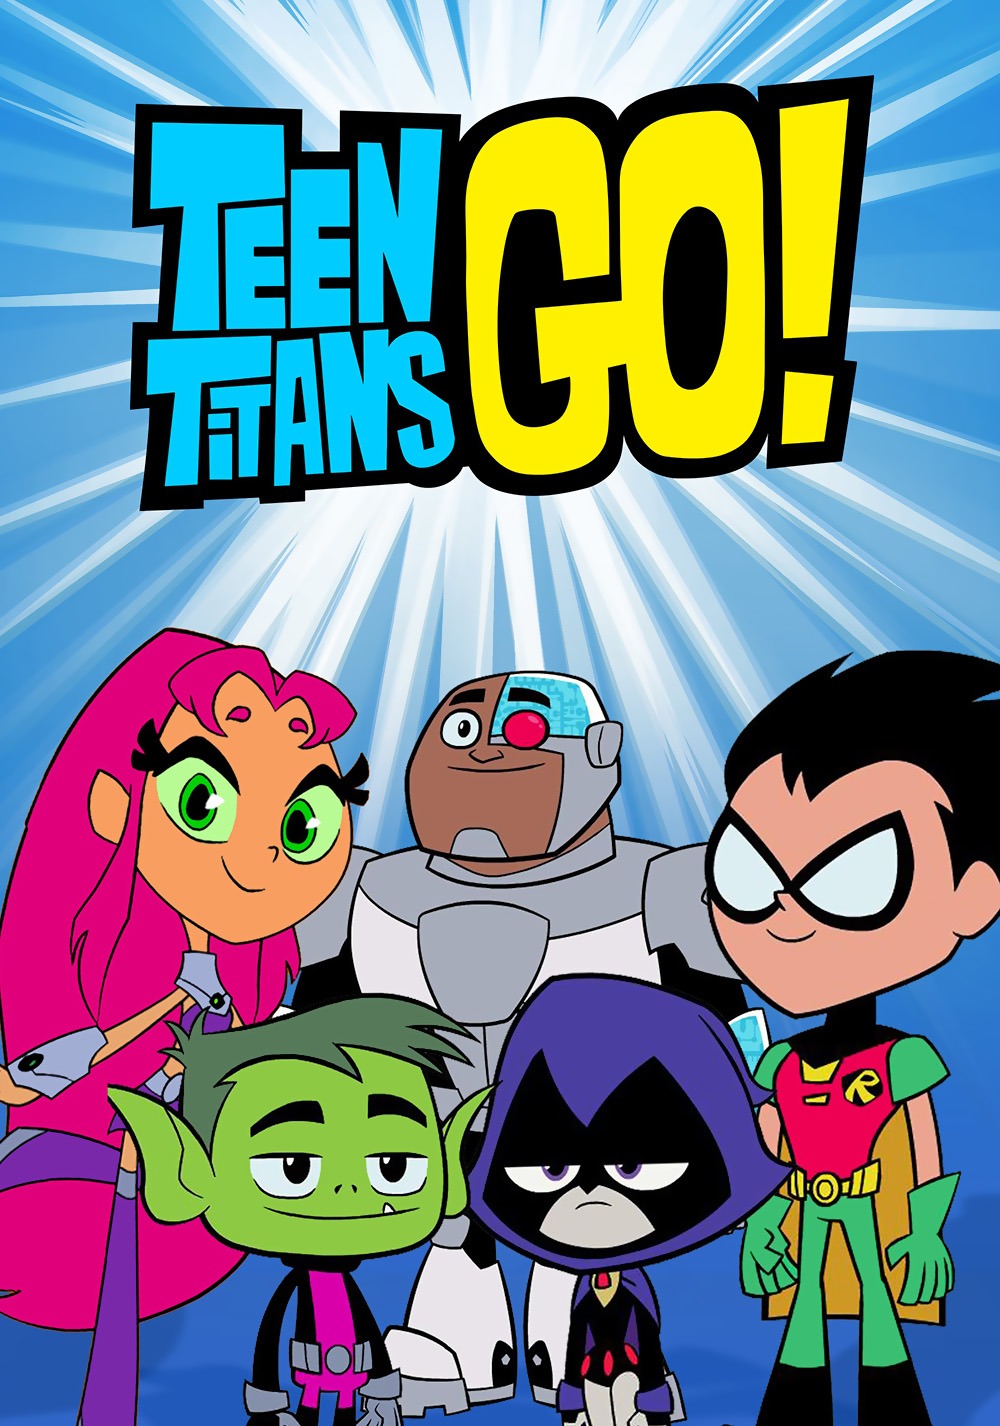 Teen Titans Go! [Season 1] [2013] [DVD9] [NTSC] [Latino] [4 DISC]